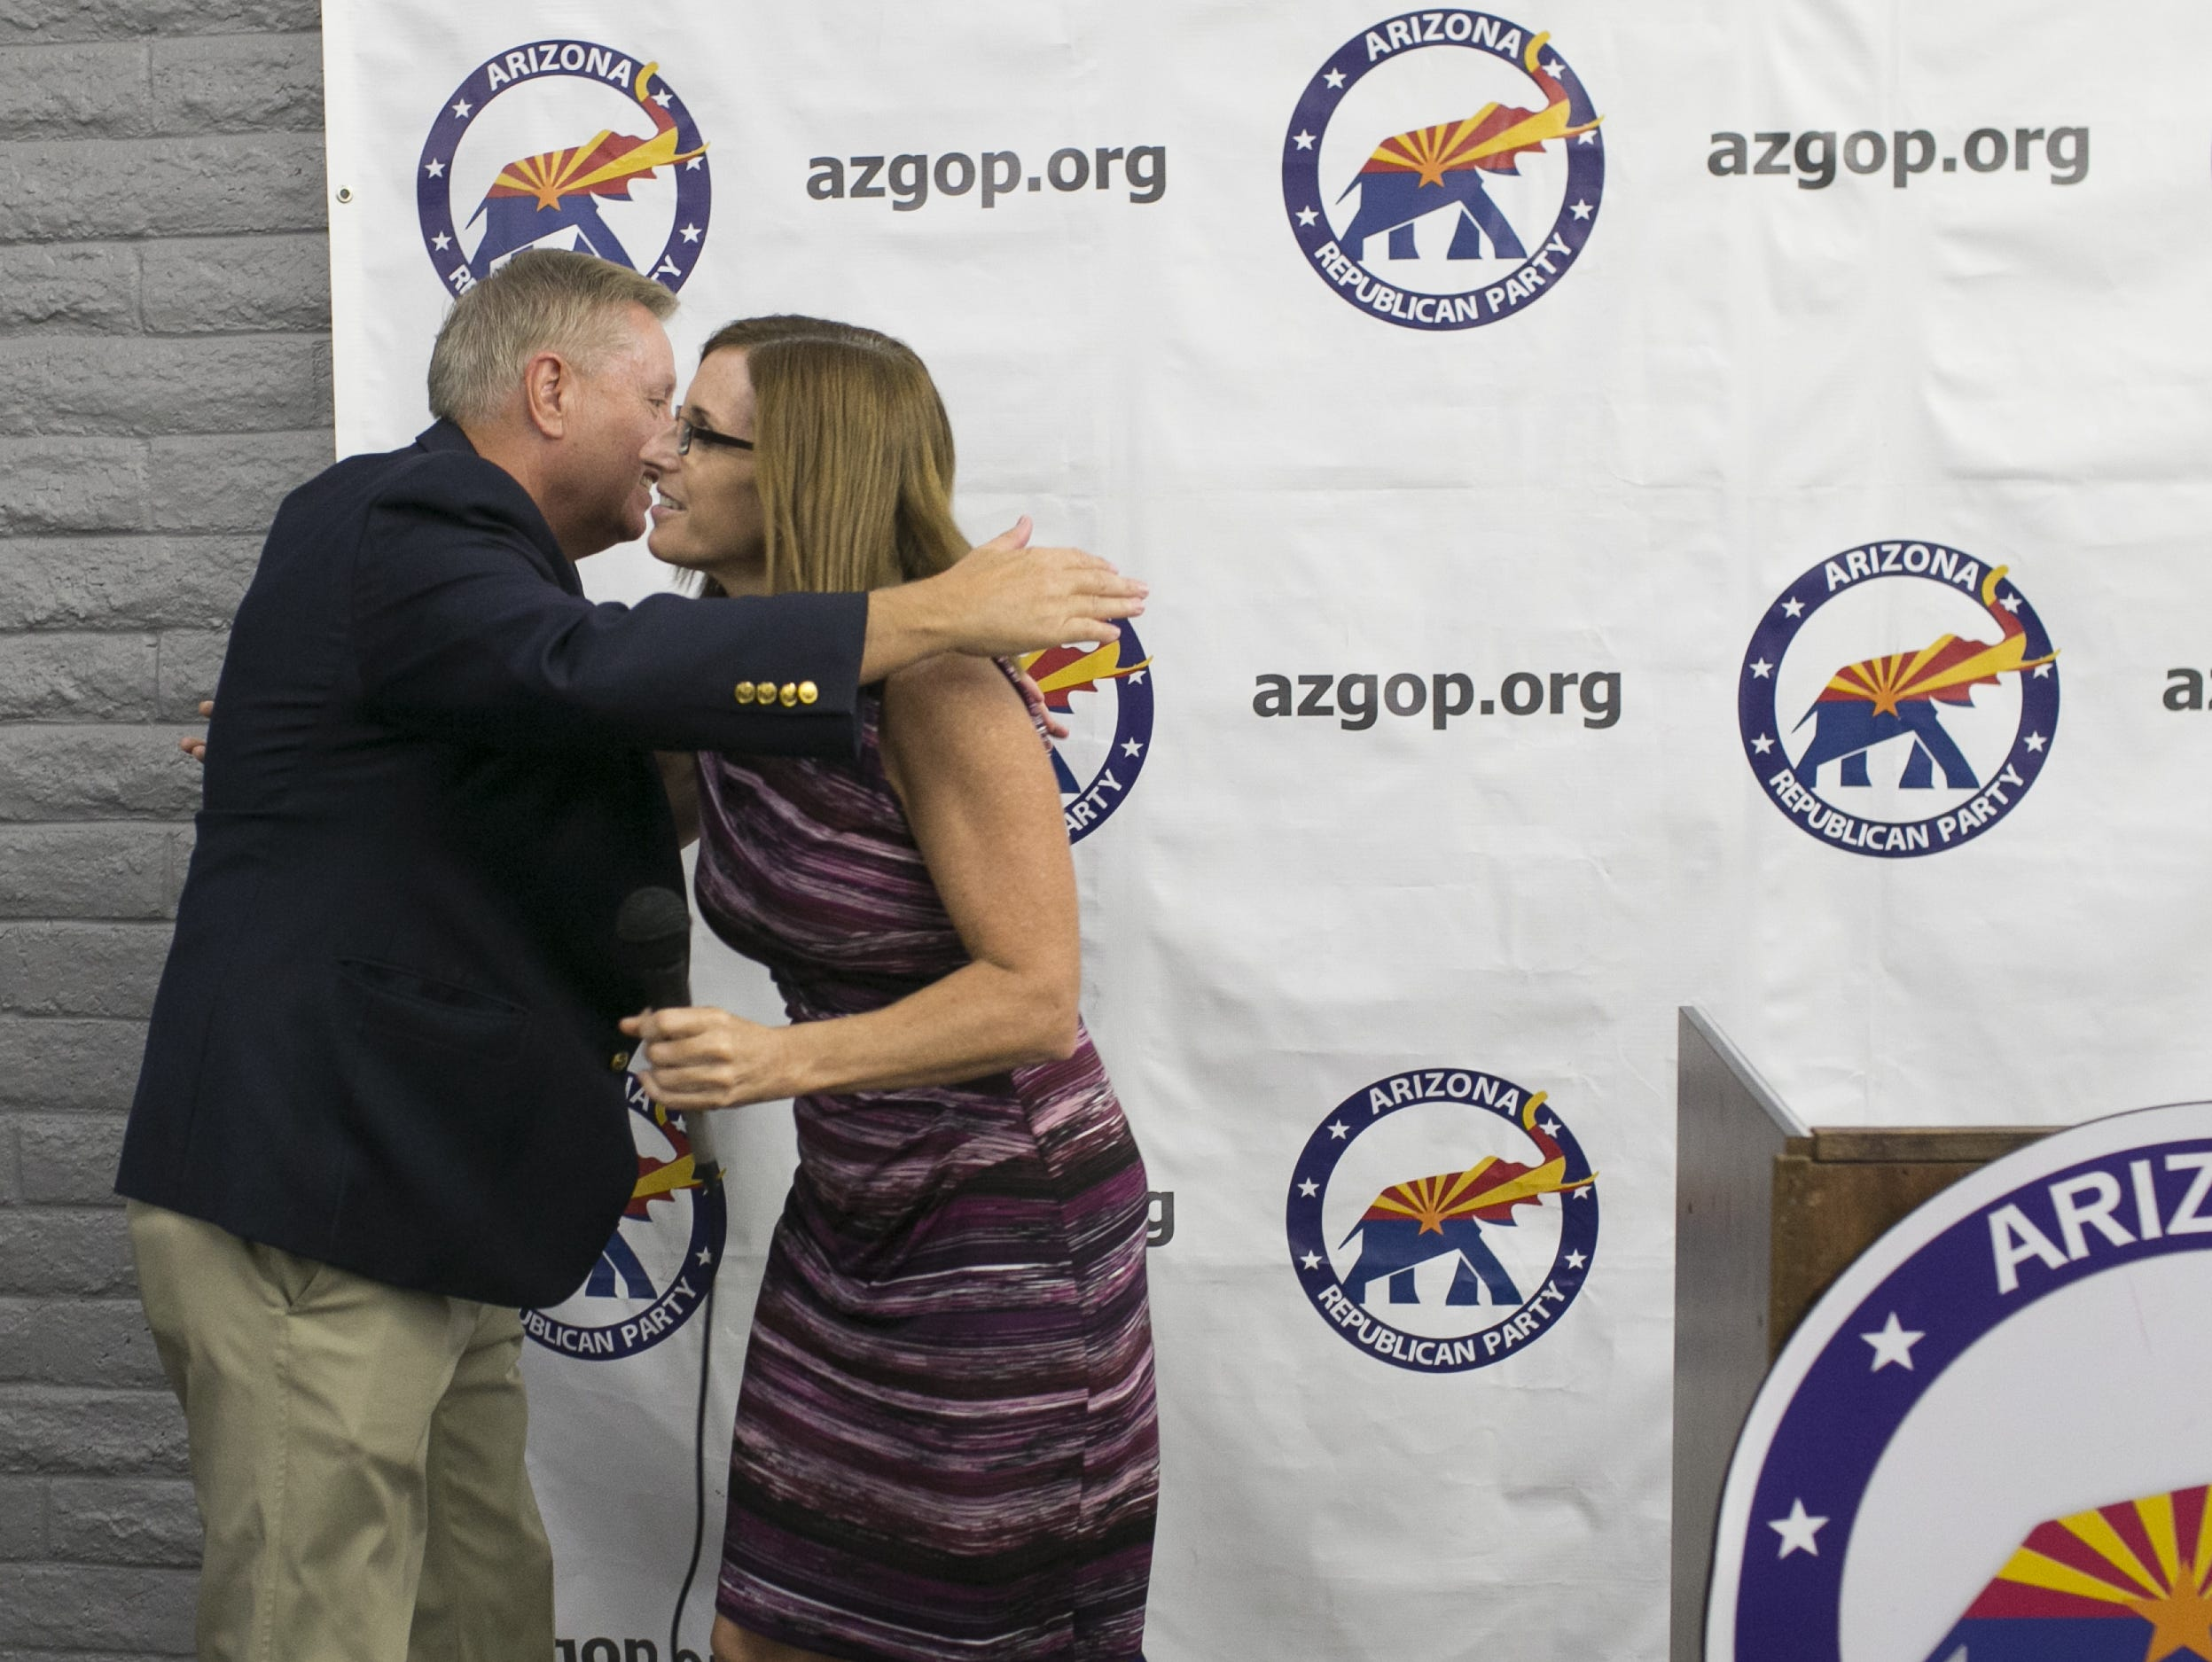 Sen. Lindsey Graham, R-S.C. hugs U.S. Senate candidate Martha McSally at the Arizona GOP headquarters in Phoenix, Ariz. on Oct. 27, 2018.